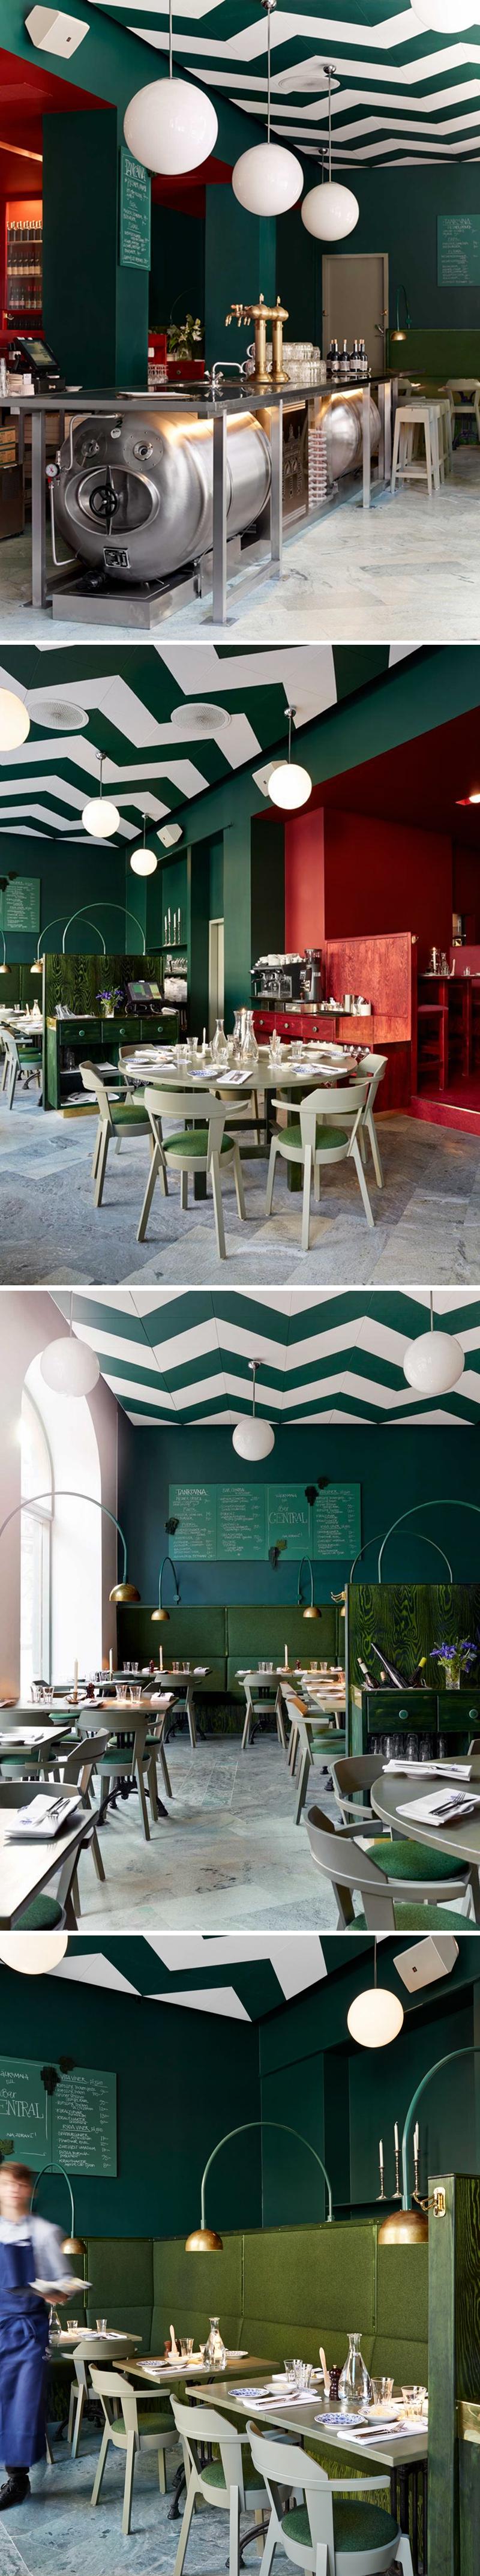 Green Interior Design In Cafe Shop Hug Your Like